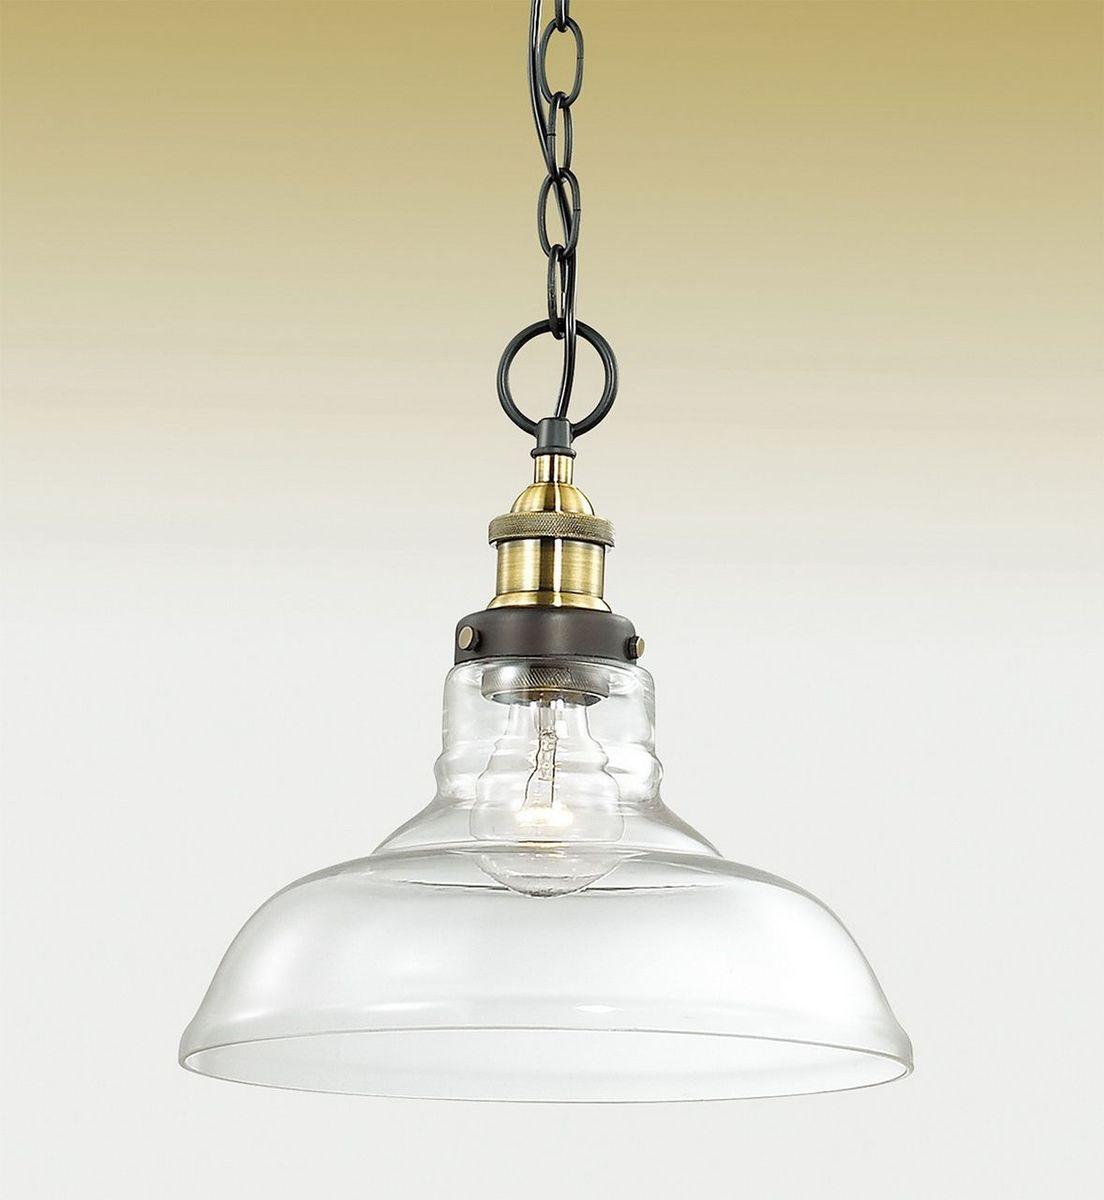 Светильник подвесной Odeon Light Latura, 1 х E27, 60W. 2899/12899/1